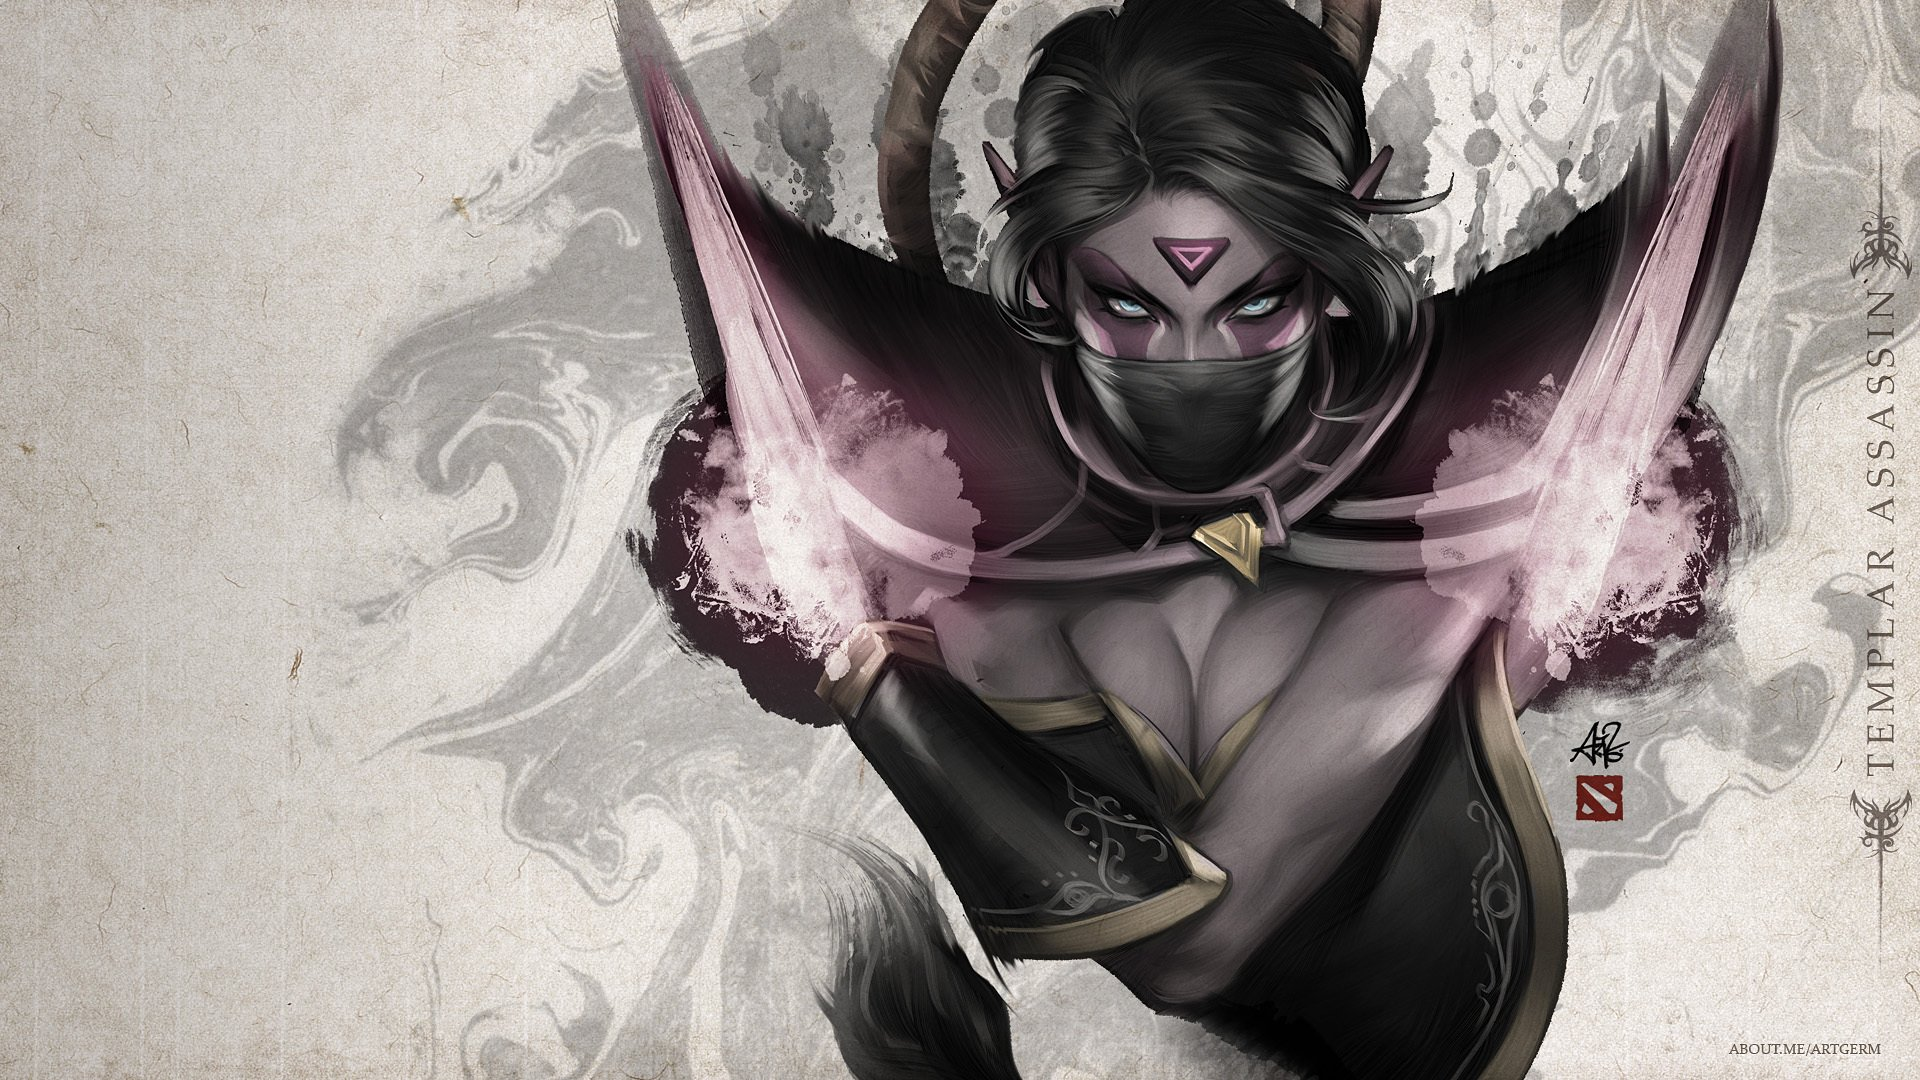 14 Templar Assassin Dota 2 Hd Wallpapers Background Images